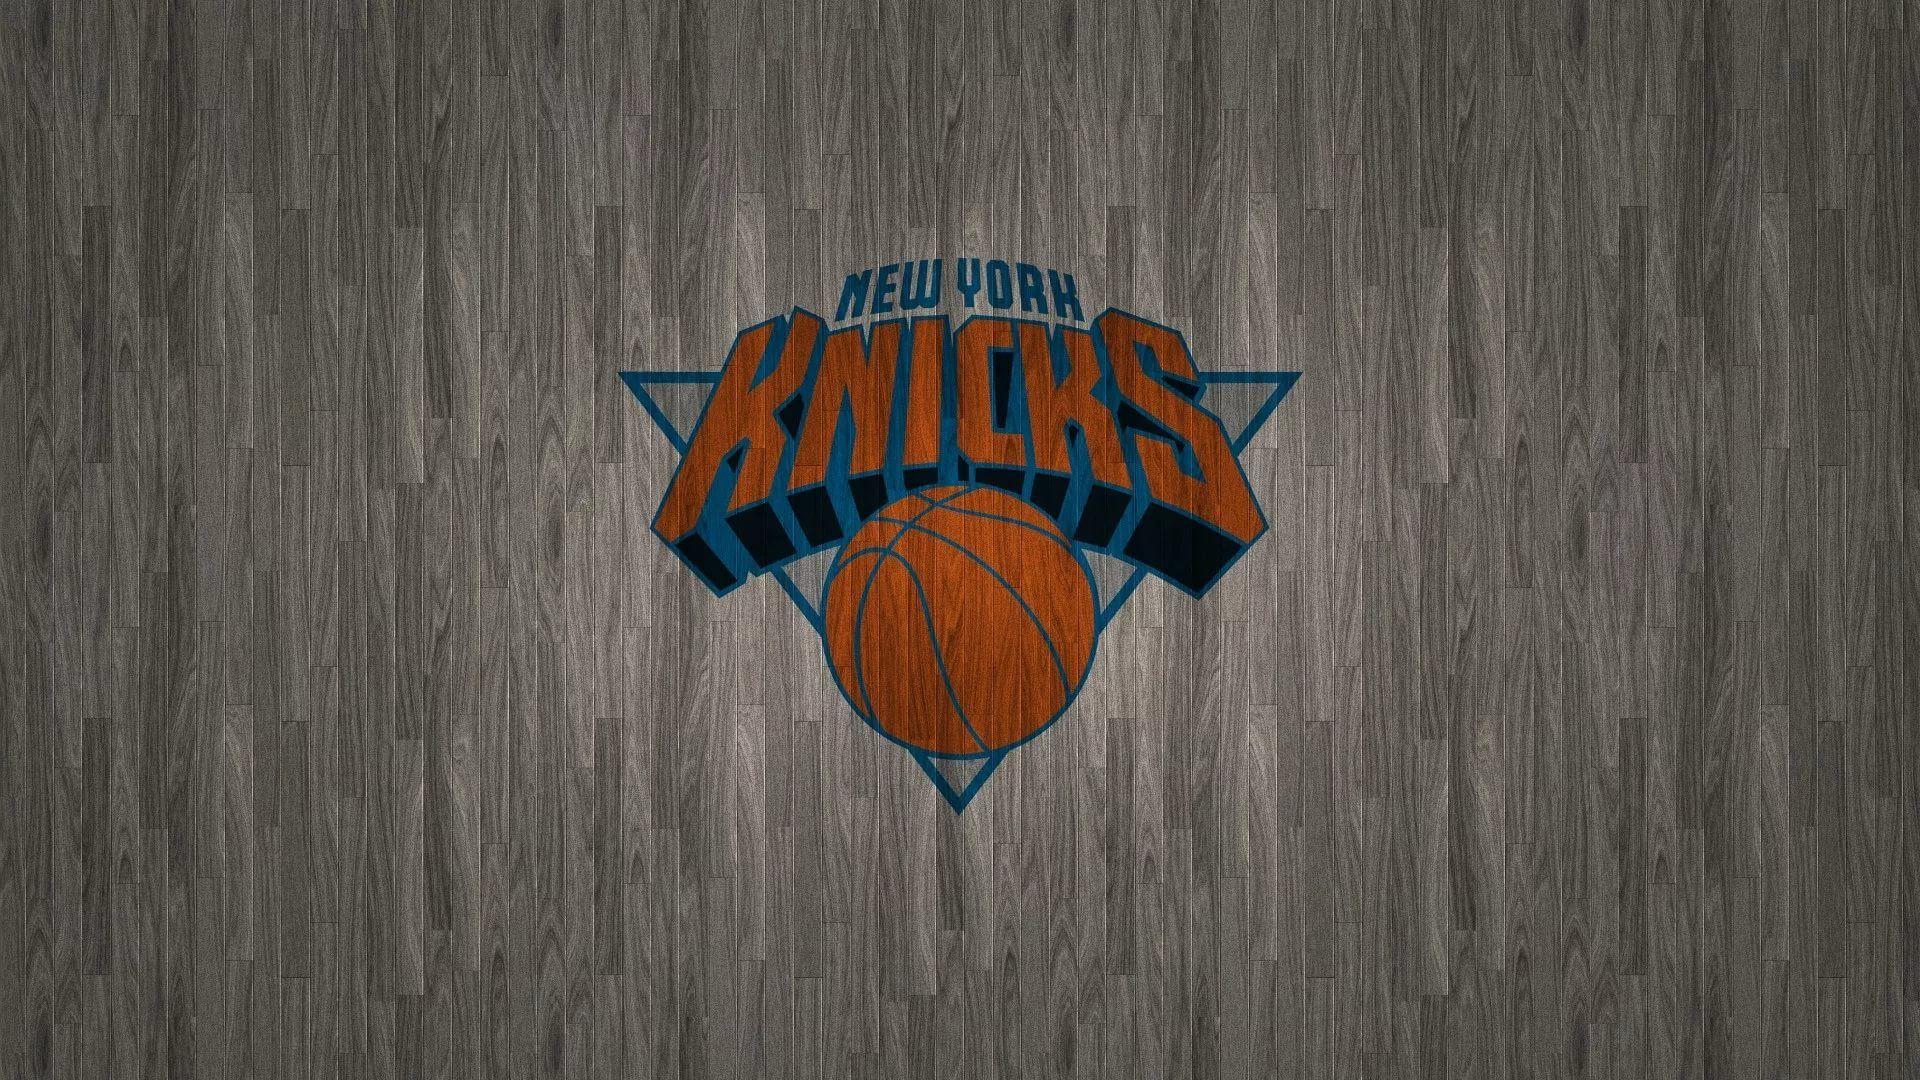 New York Knicks free download wallpaper